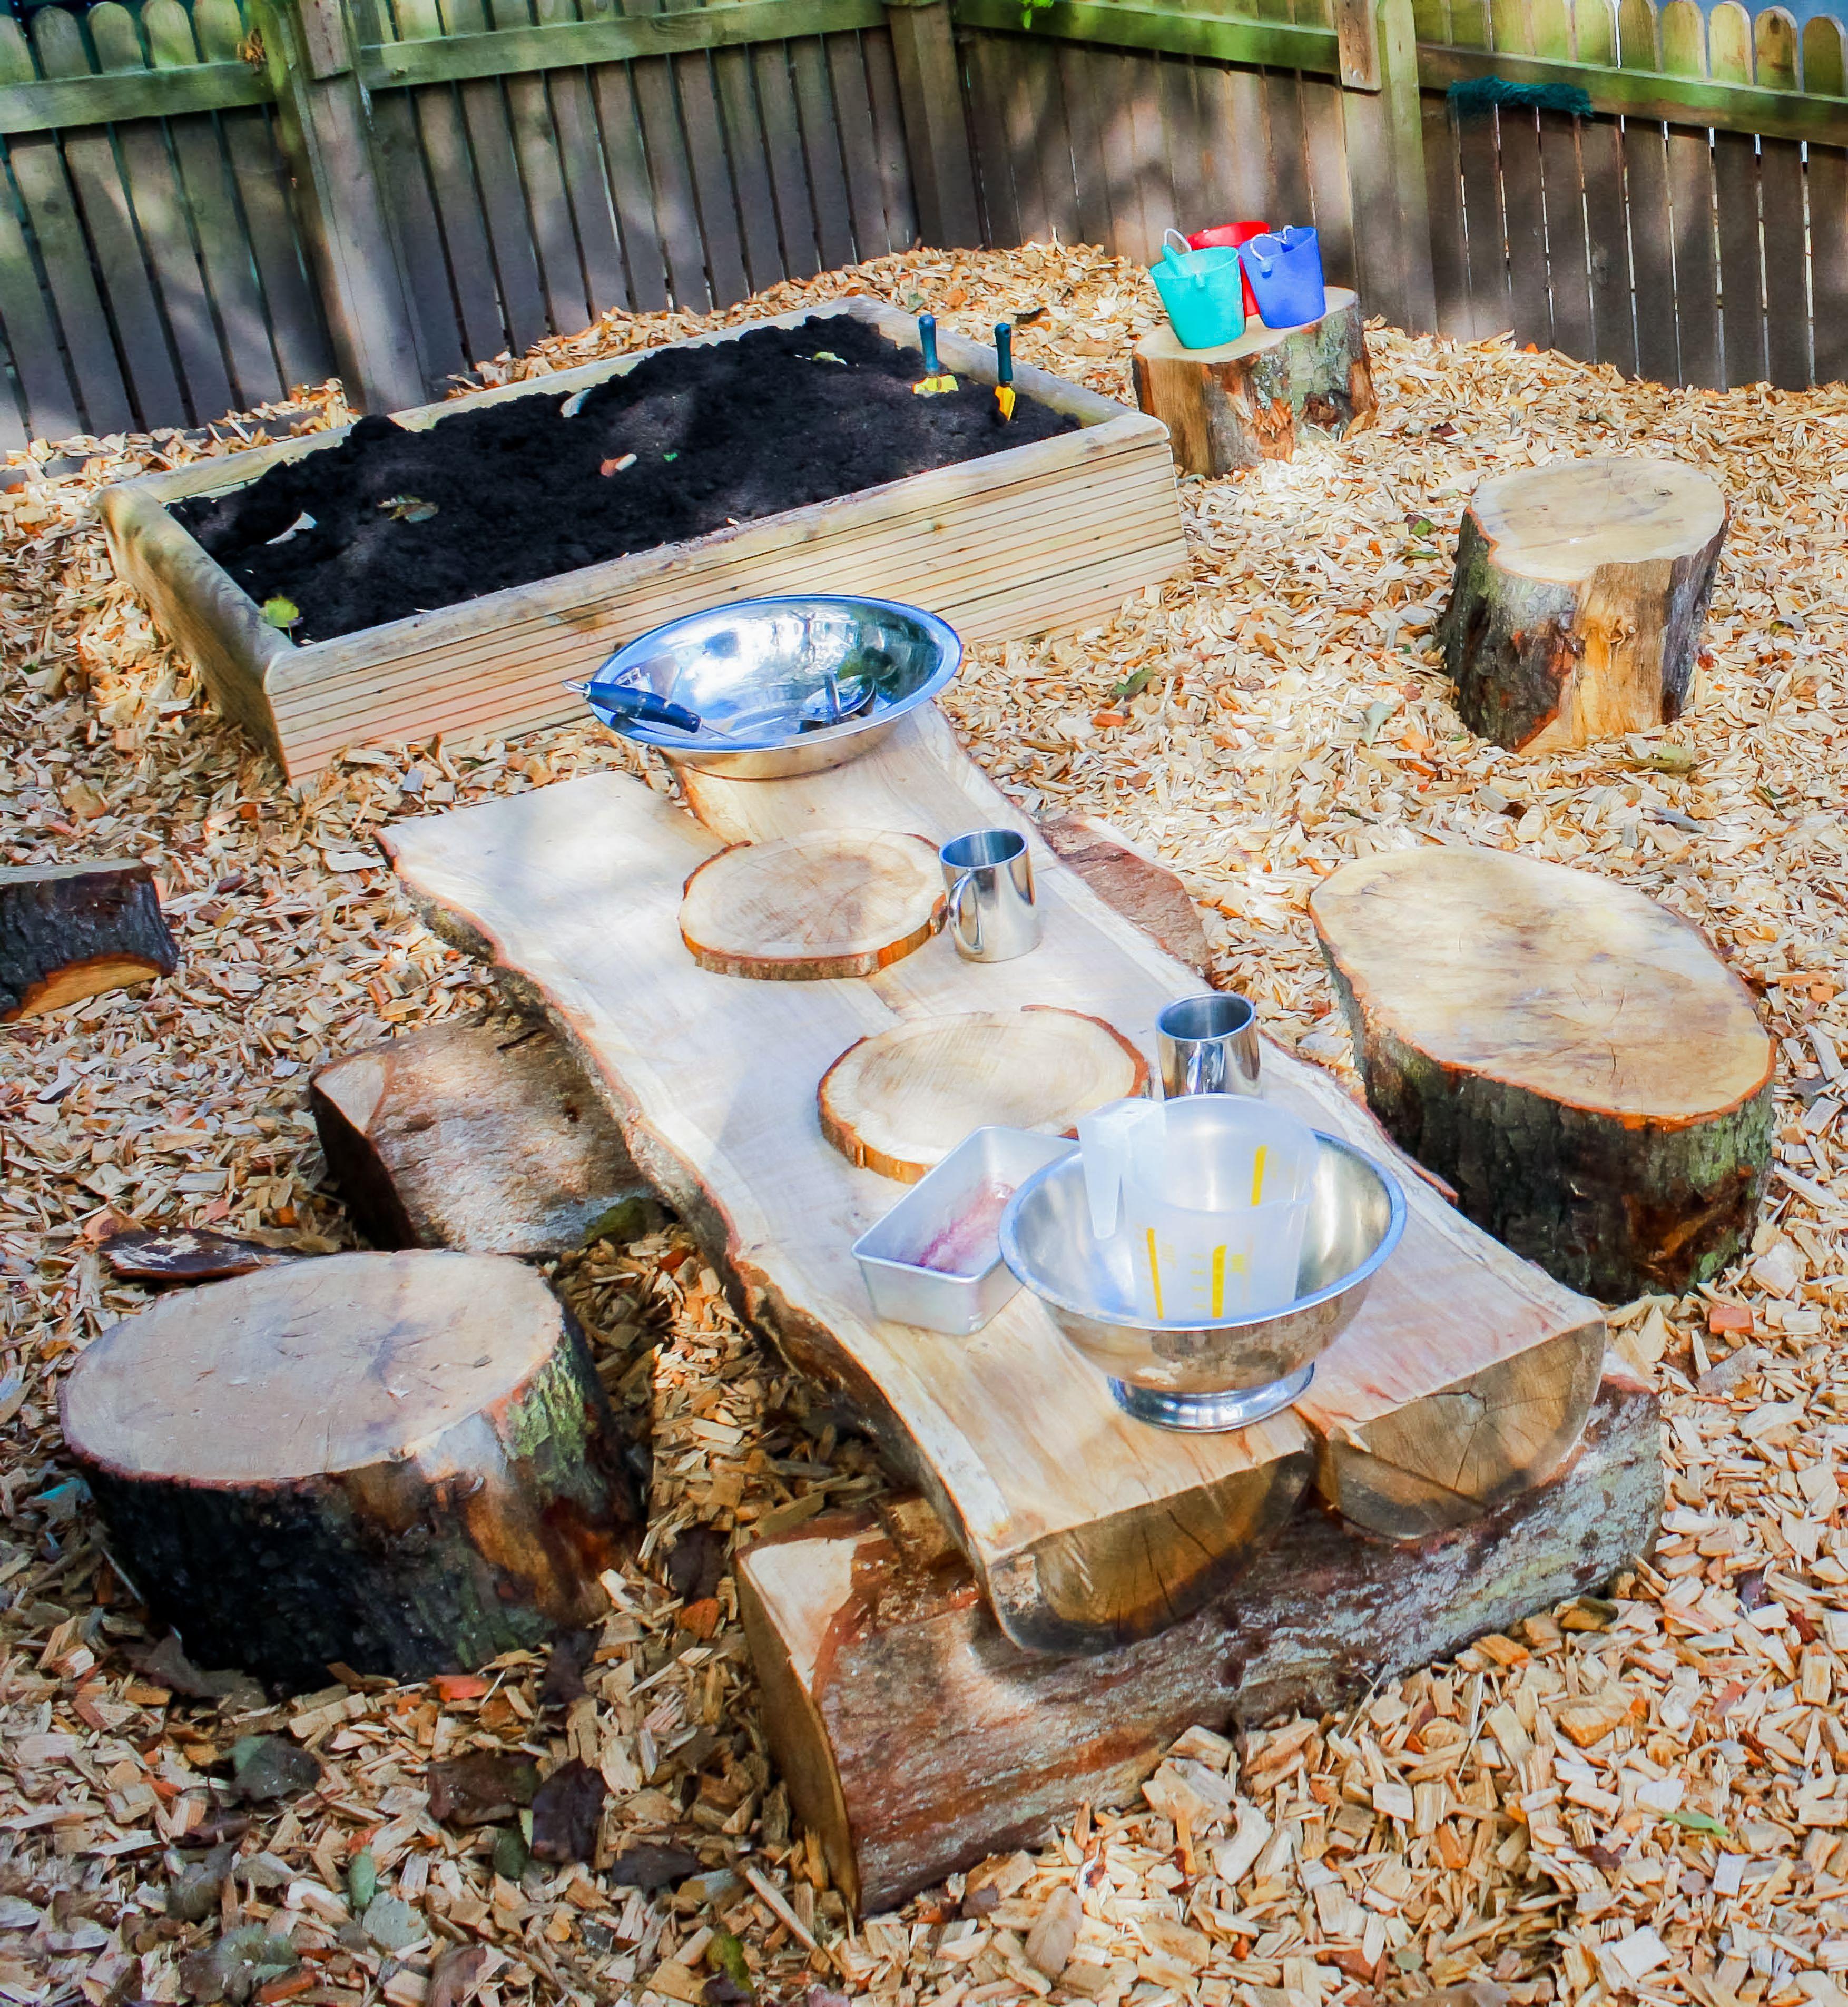 Pin by Infinite Playgrounds on Infinite Mud Kitchen